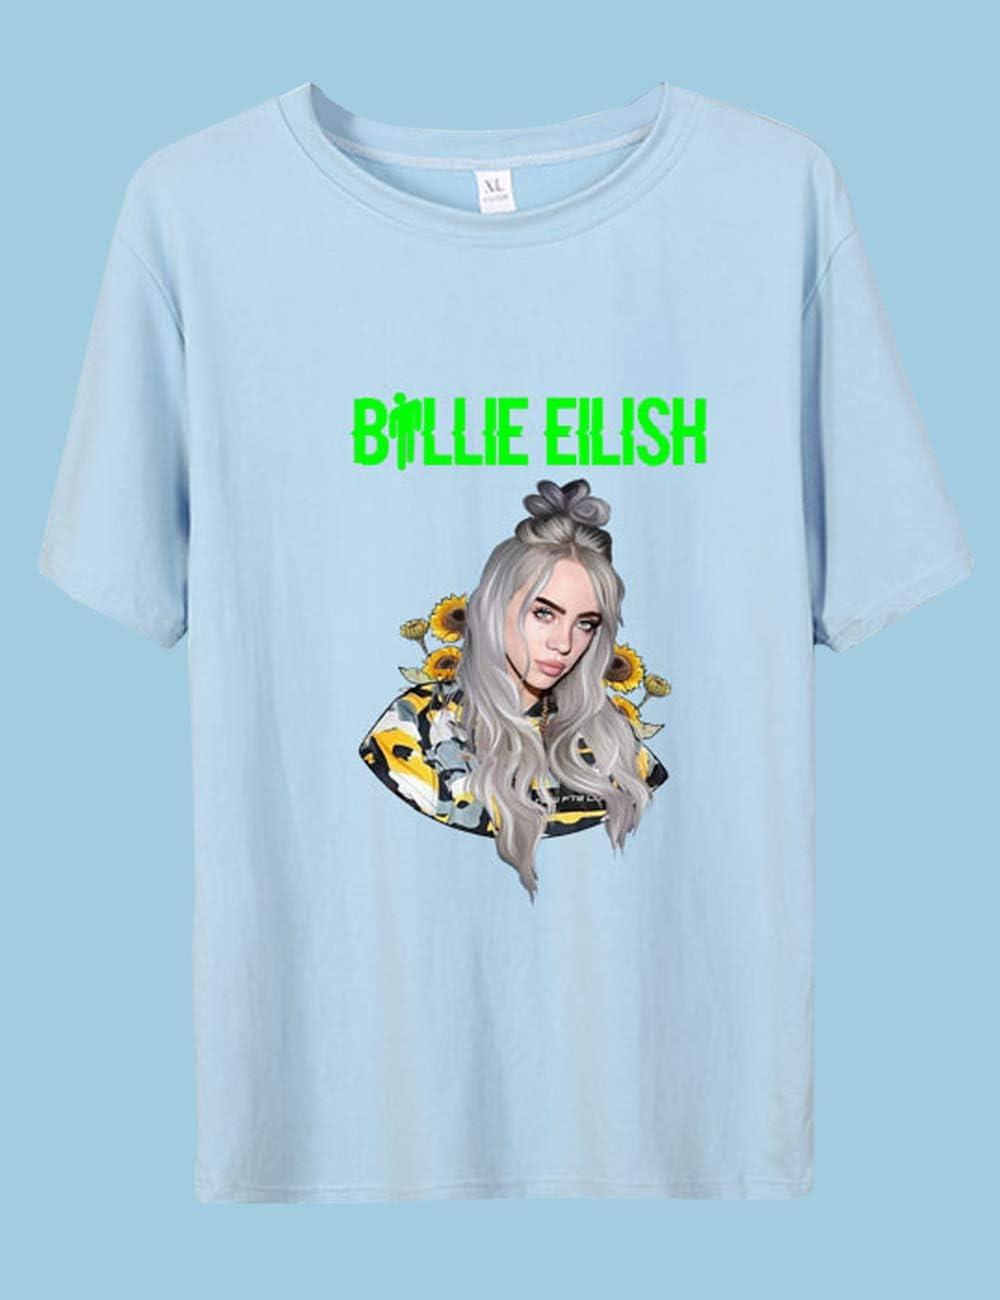 Siennaa Billie Eilish Camiseta para mujer, adolescente, niña, Bellyache, verde neón, impresión 3D, camiseta para mujer, hombre, baño, Guy, verano, camisetas, When We All Fall Asleep, manga corta, color A-Blau, tamaño xxxx-large: